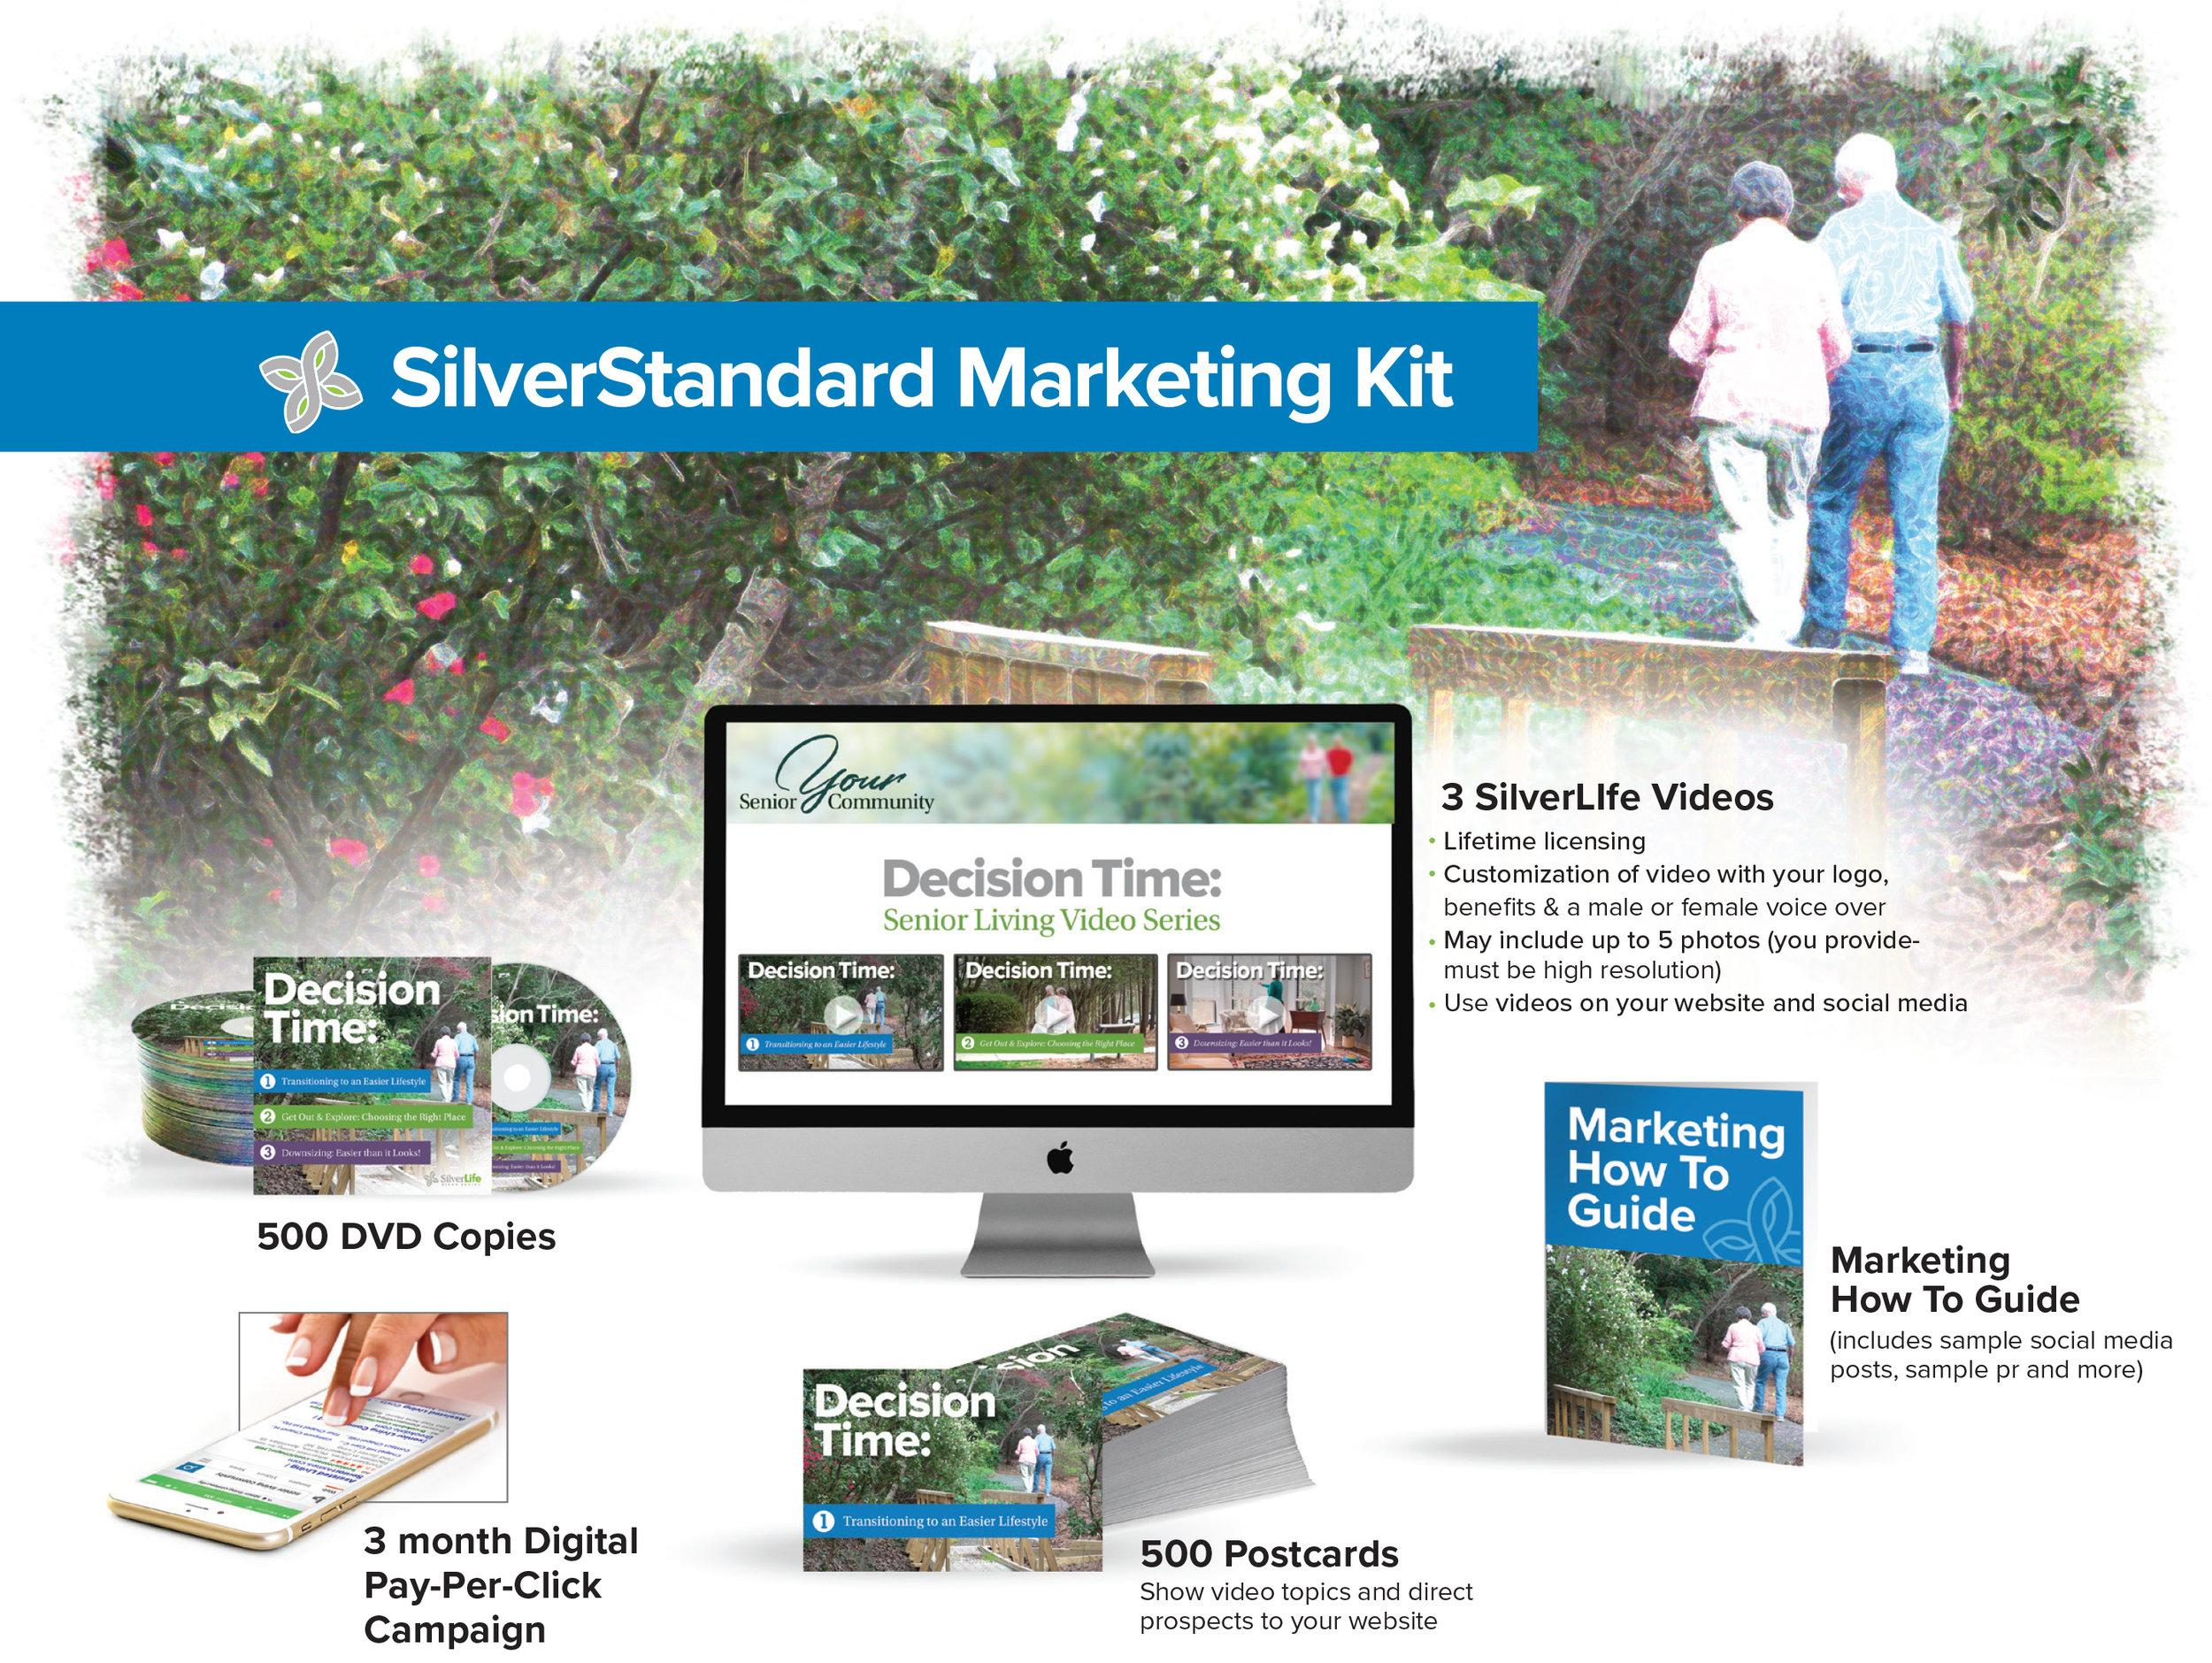 Silver Standard Marketing Kit